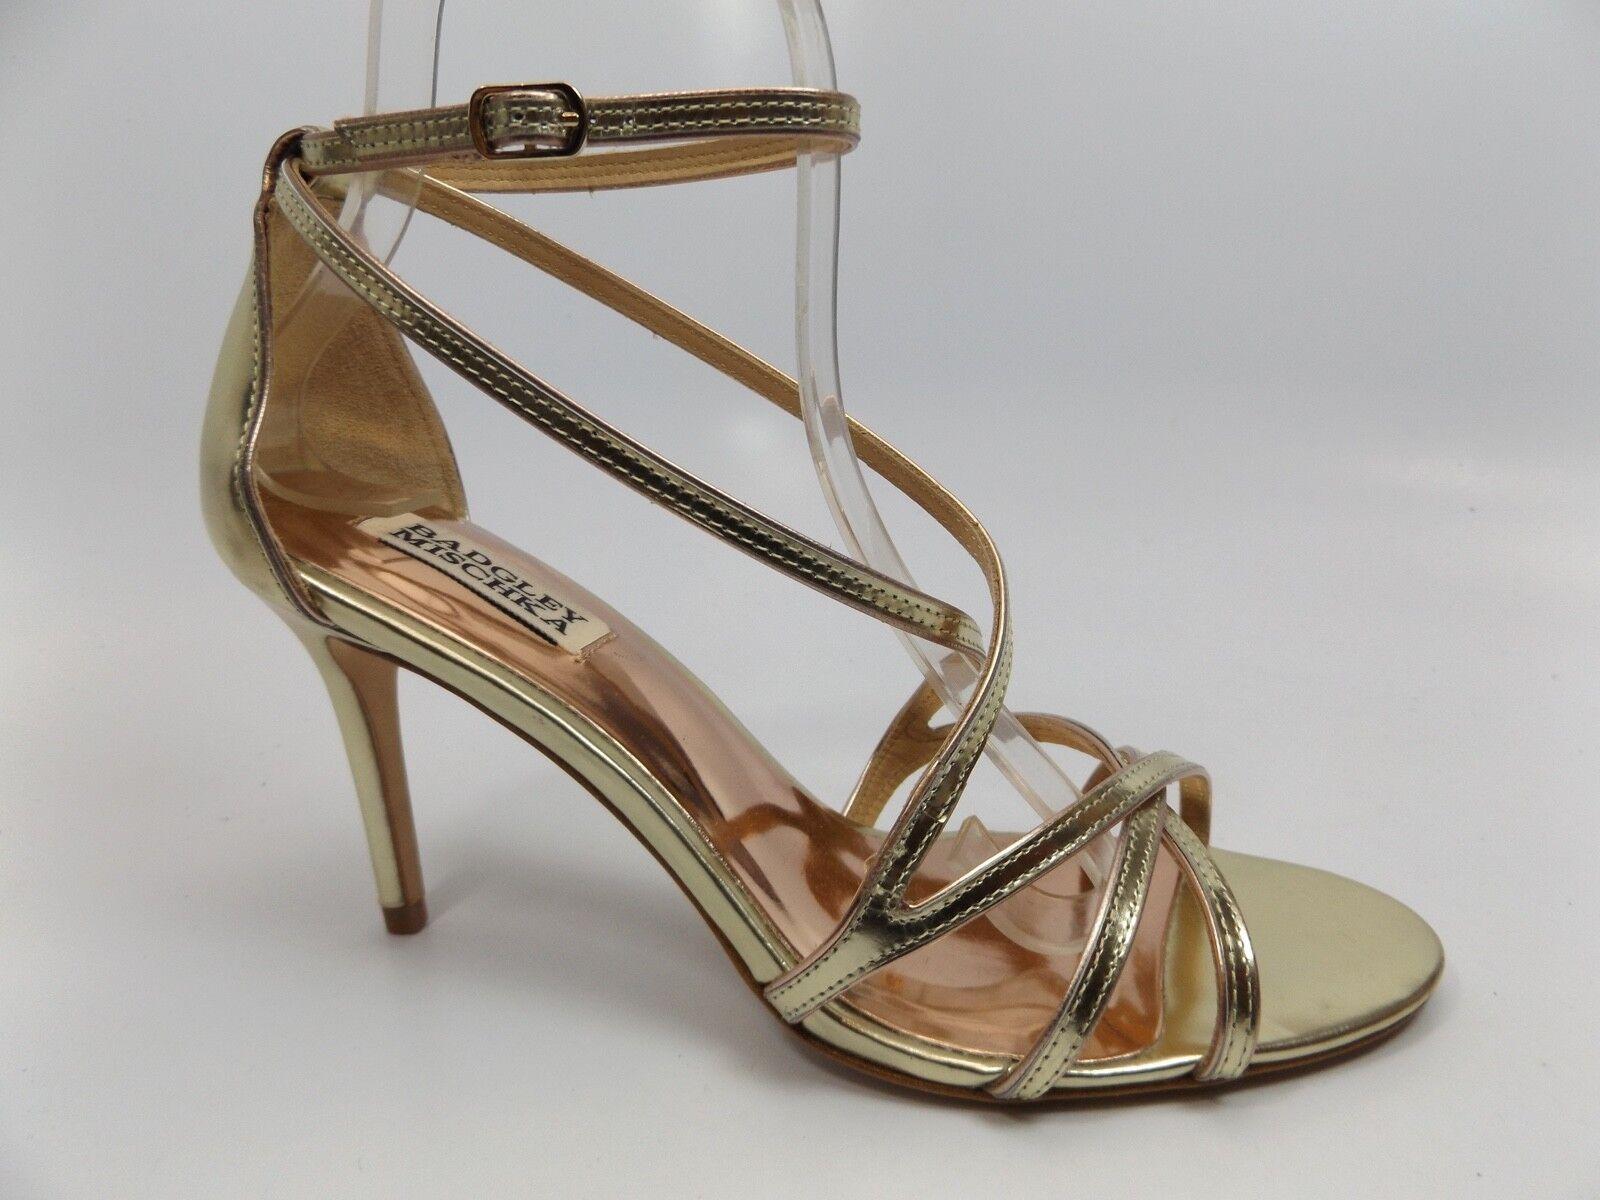 BADGLEY MISCHKA Womens Lillian Leather Open Toe, Platino, SZ 8.0 M NEW  D9675